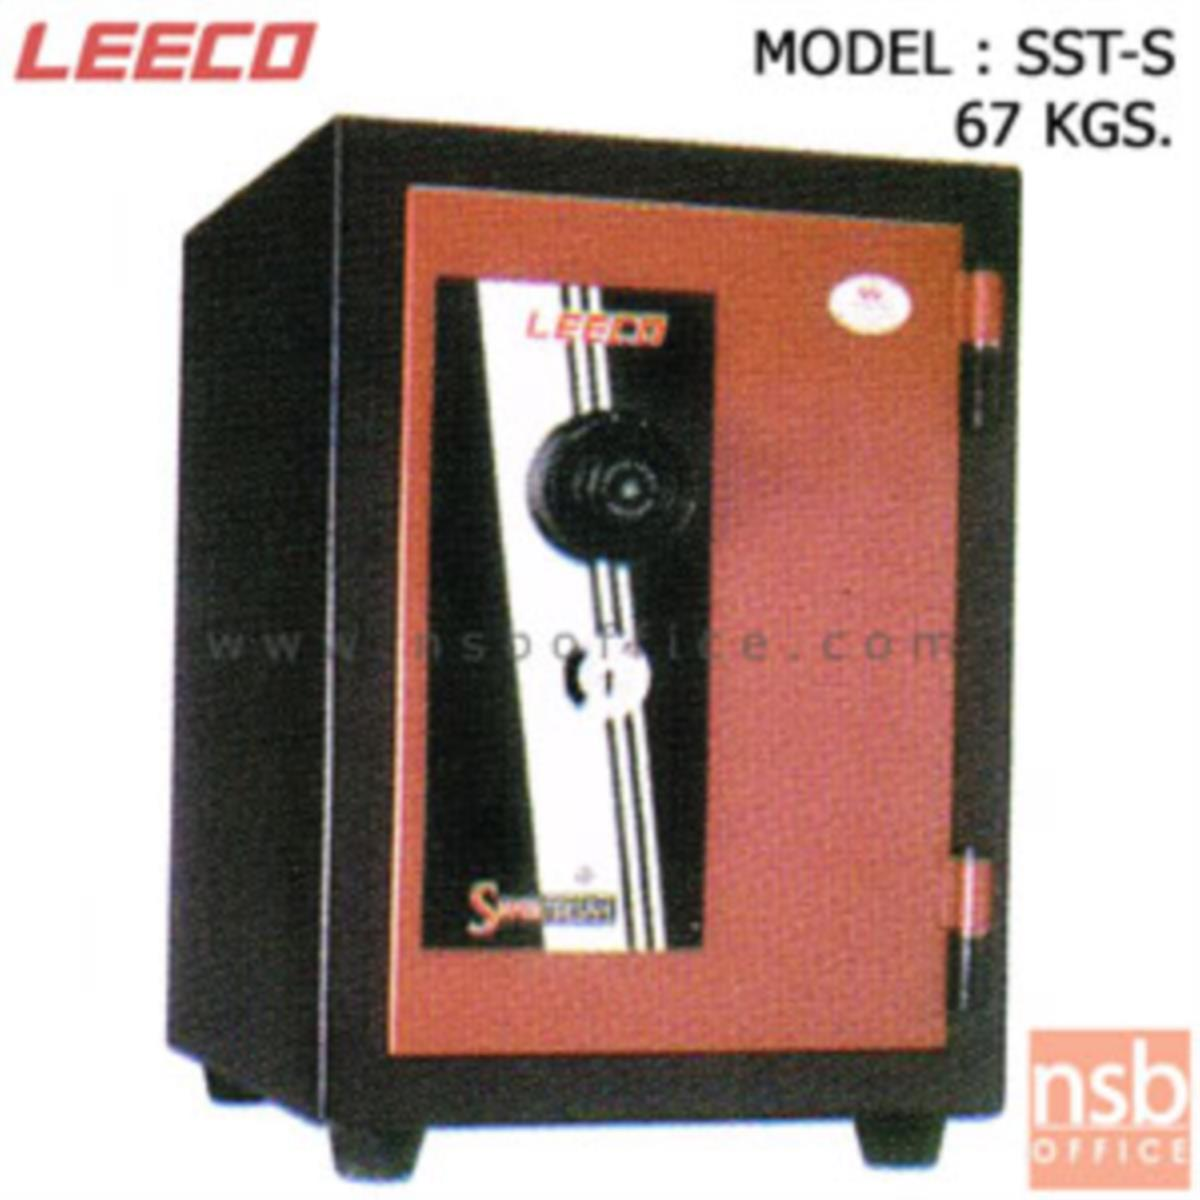 F02A039:ตู้เซฟนิรภัย 67 กก.(แนวตั้ง) ลีโก้ รุ่น SST-S มี 1 กุญแจ 1 รหัส (ตั้งรหัสได้)